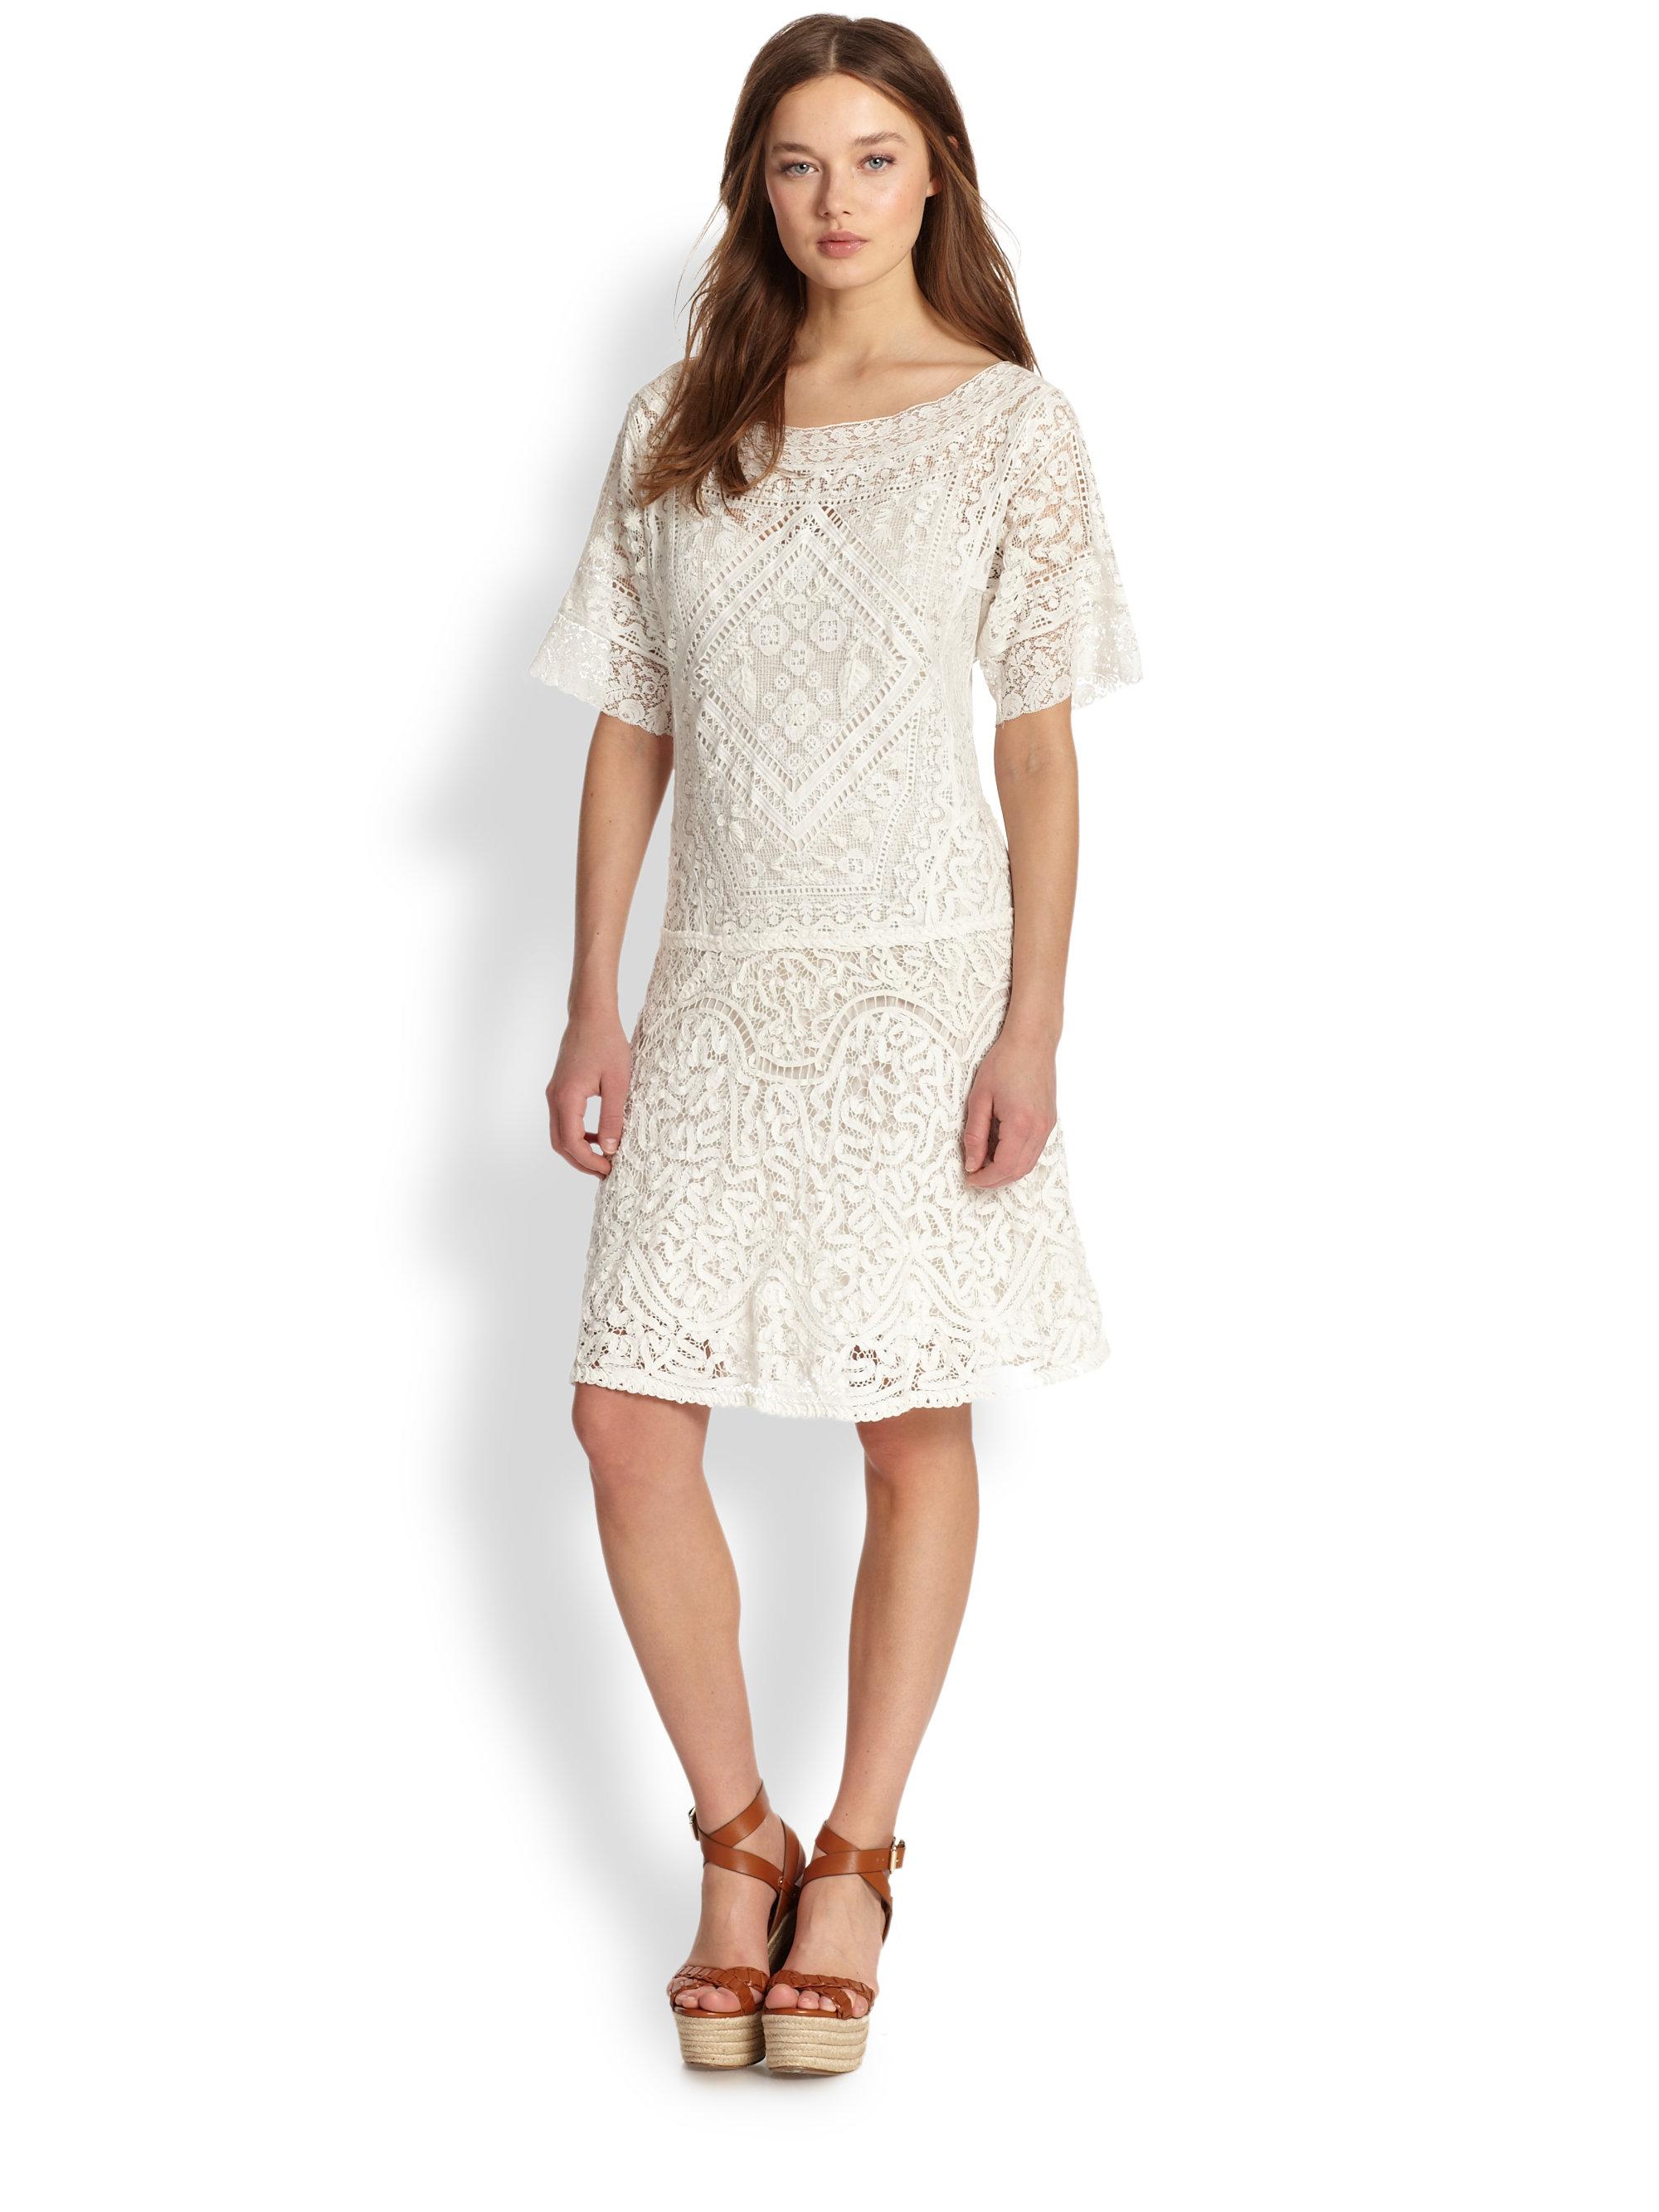 993b28afbcf8 Ralph Lauren Blue Label Tatiana Lace Dress in White - Lyst